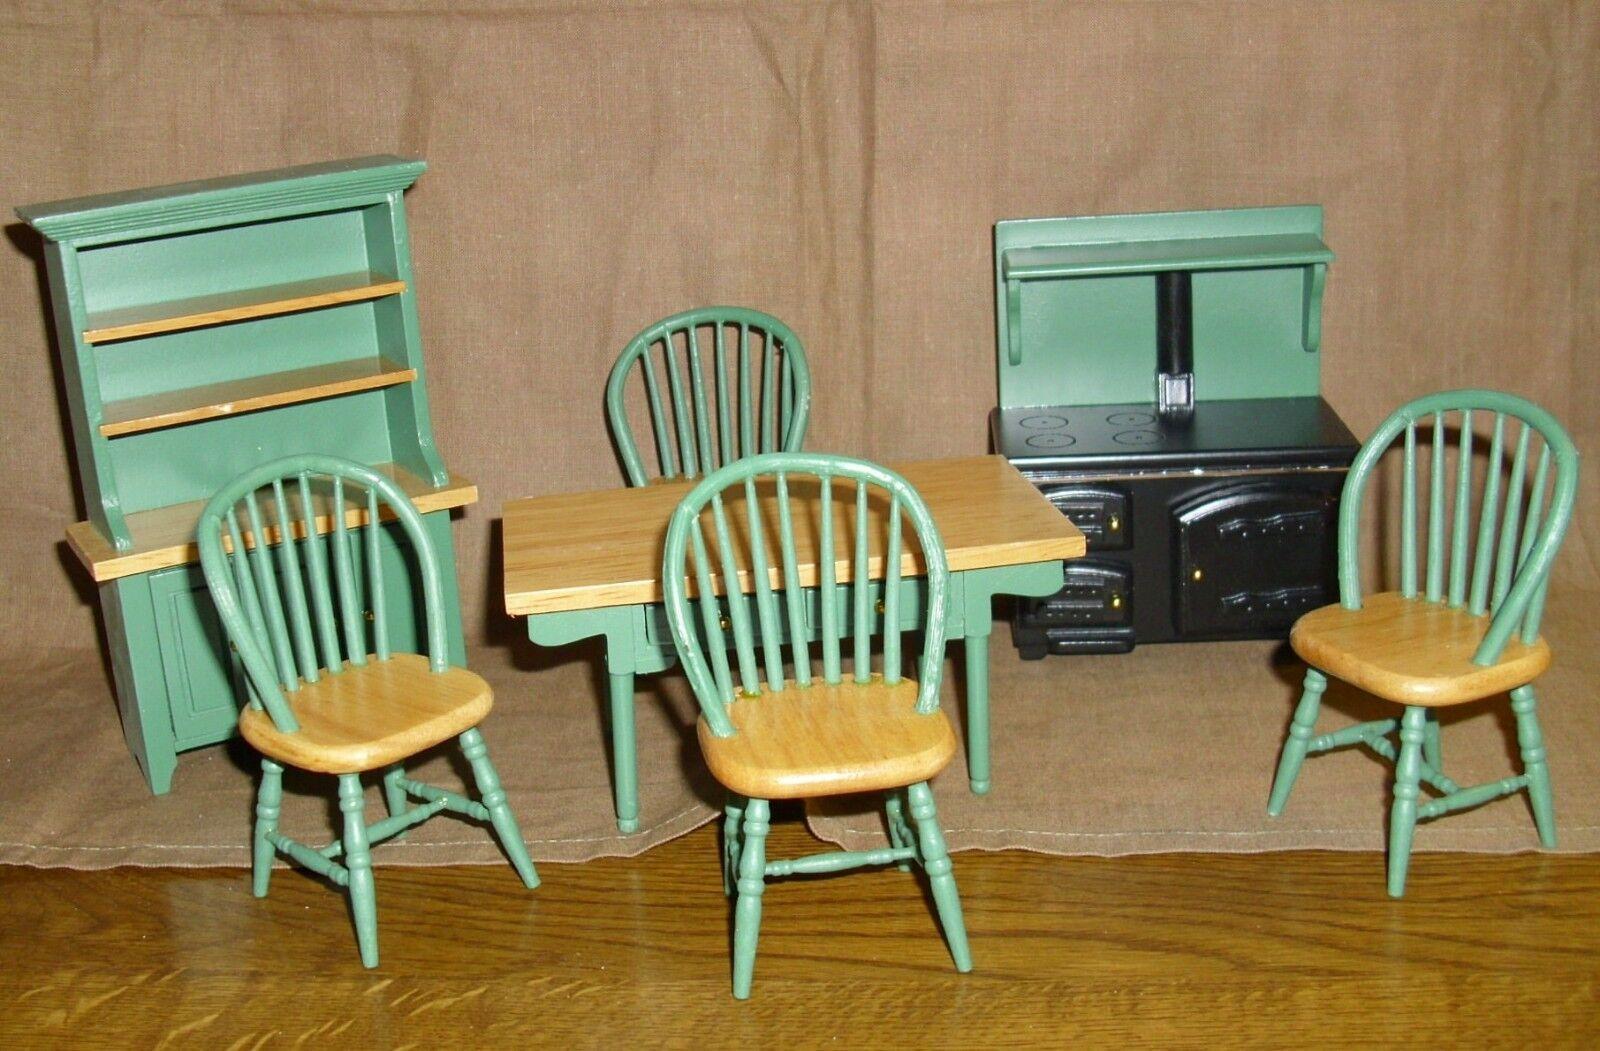 Komplette Küche - buche buche buche   grün - incl. Herd  - Miniatur 1 12 7d7ab3